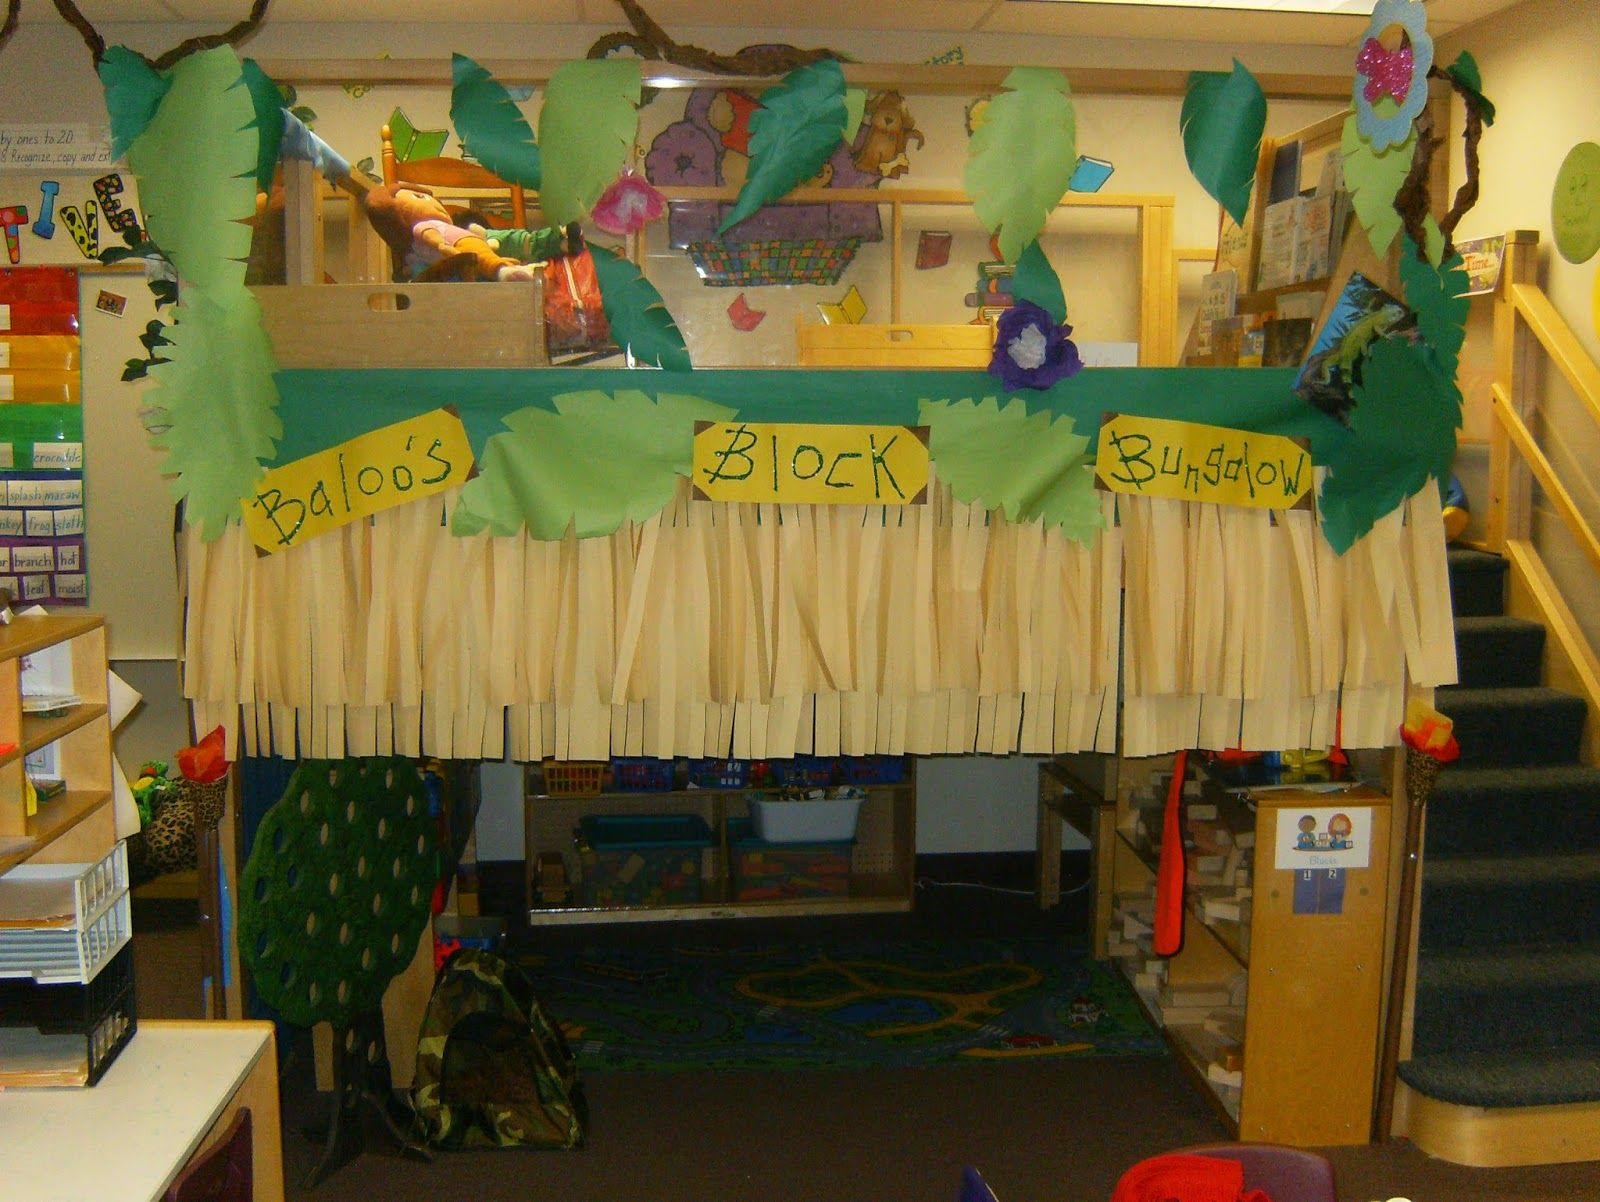 Baloo S Block Bunglow Block Center Preschool Decoration Jungle Rainforest Theme